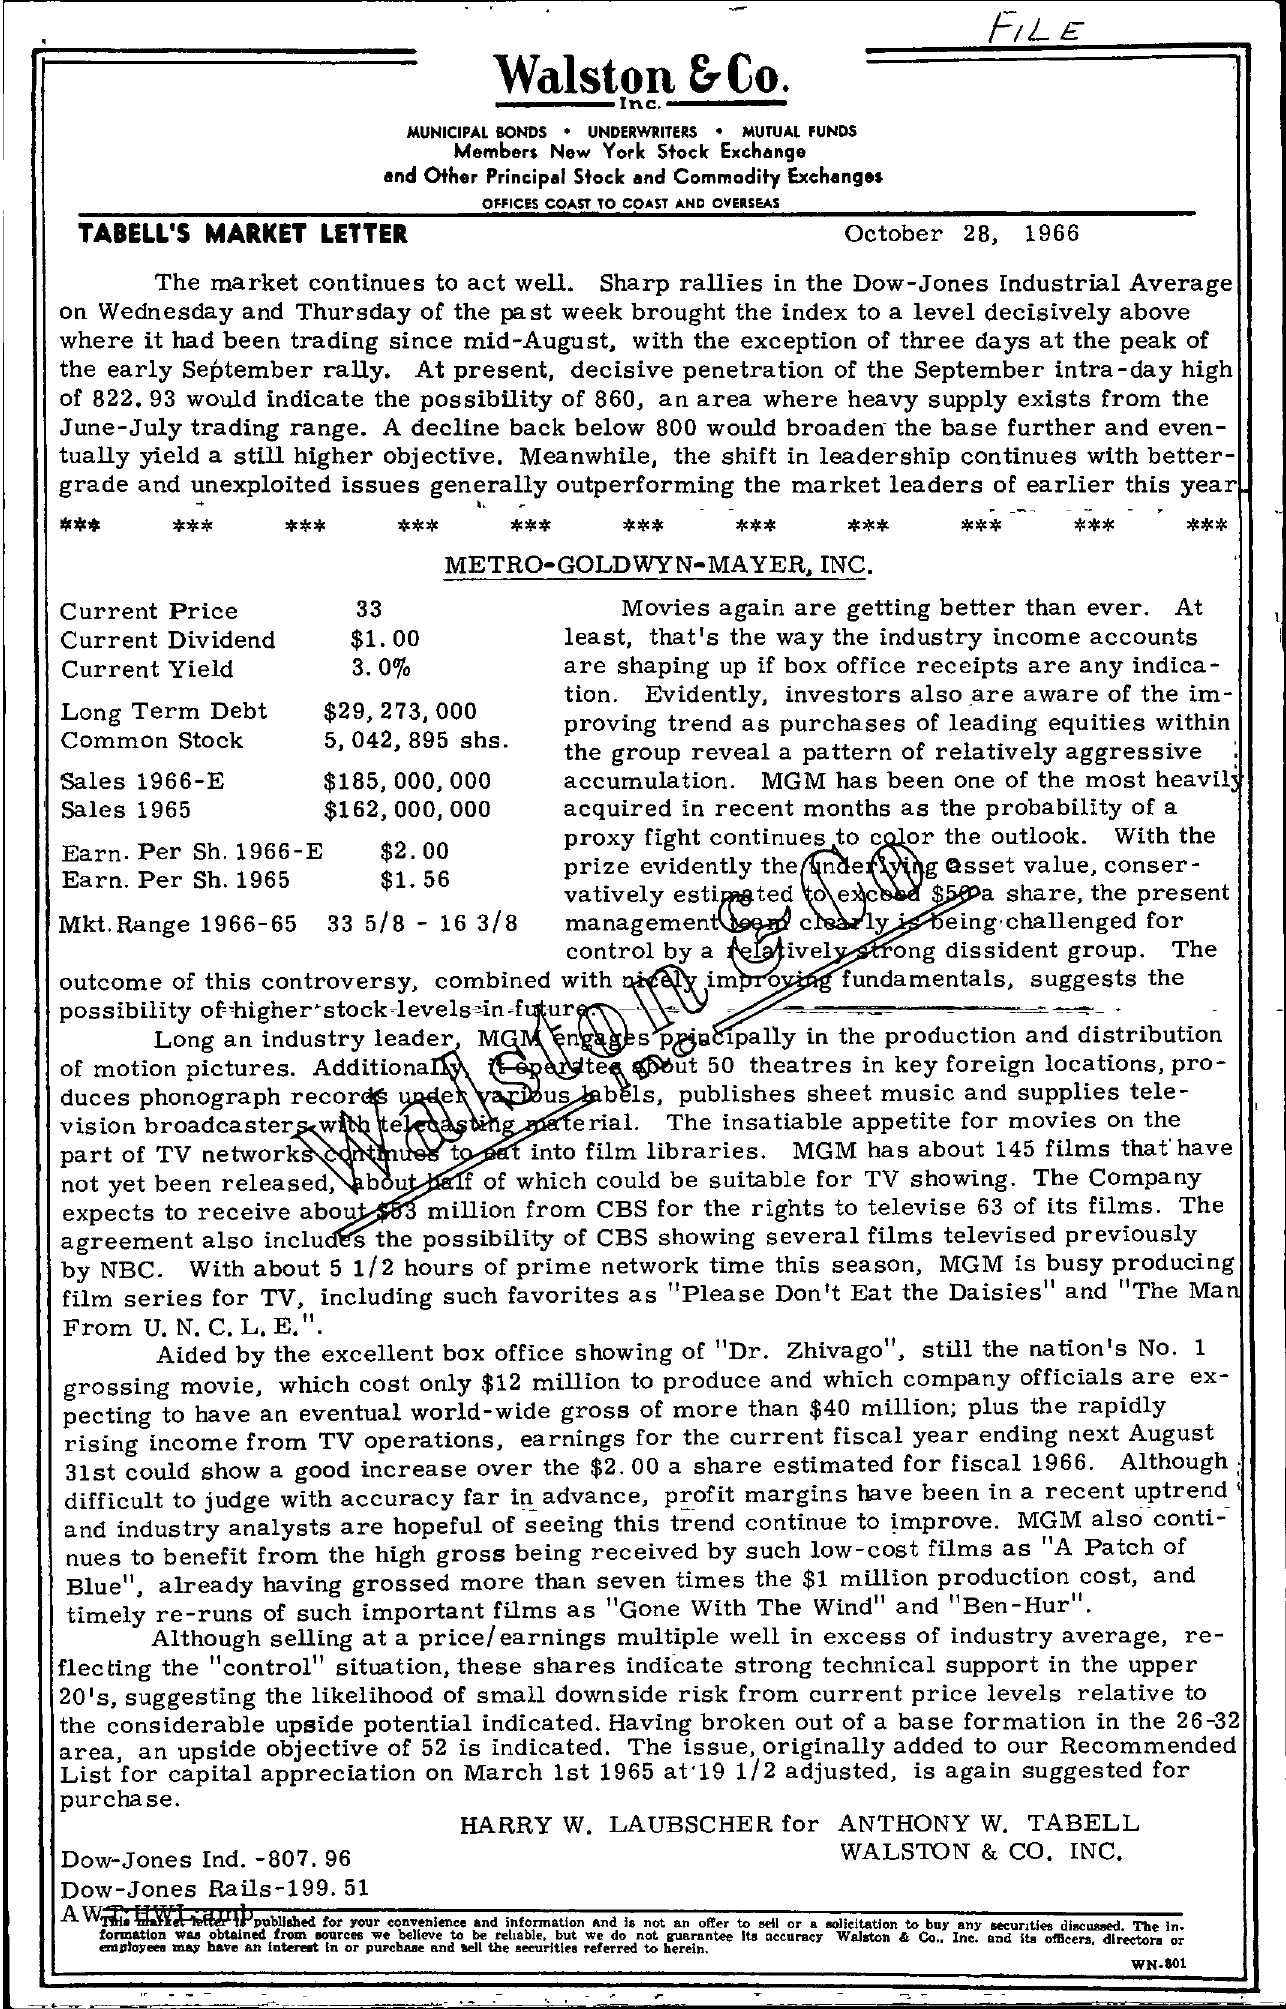 Tabell's Market Letter - October 28, 1966